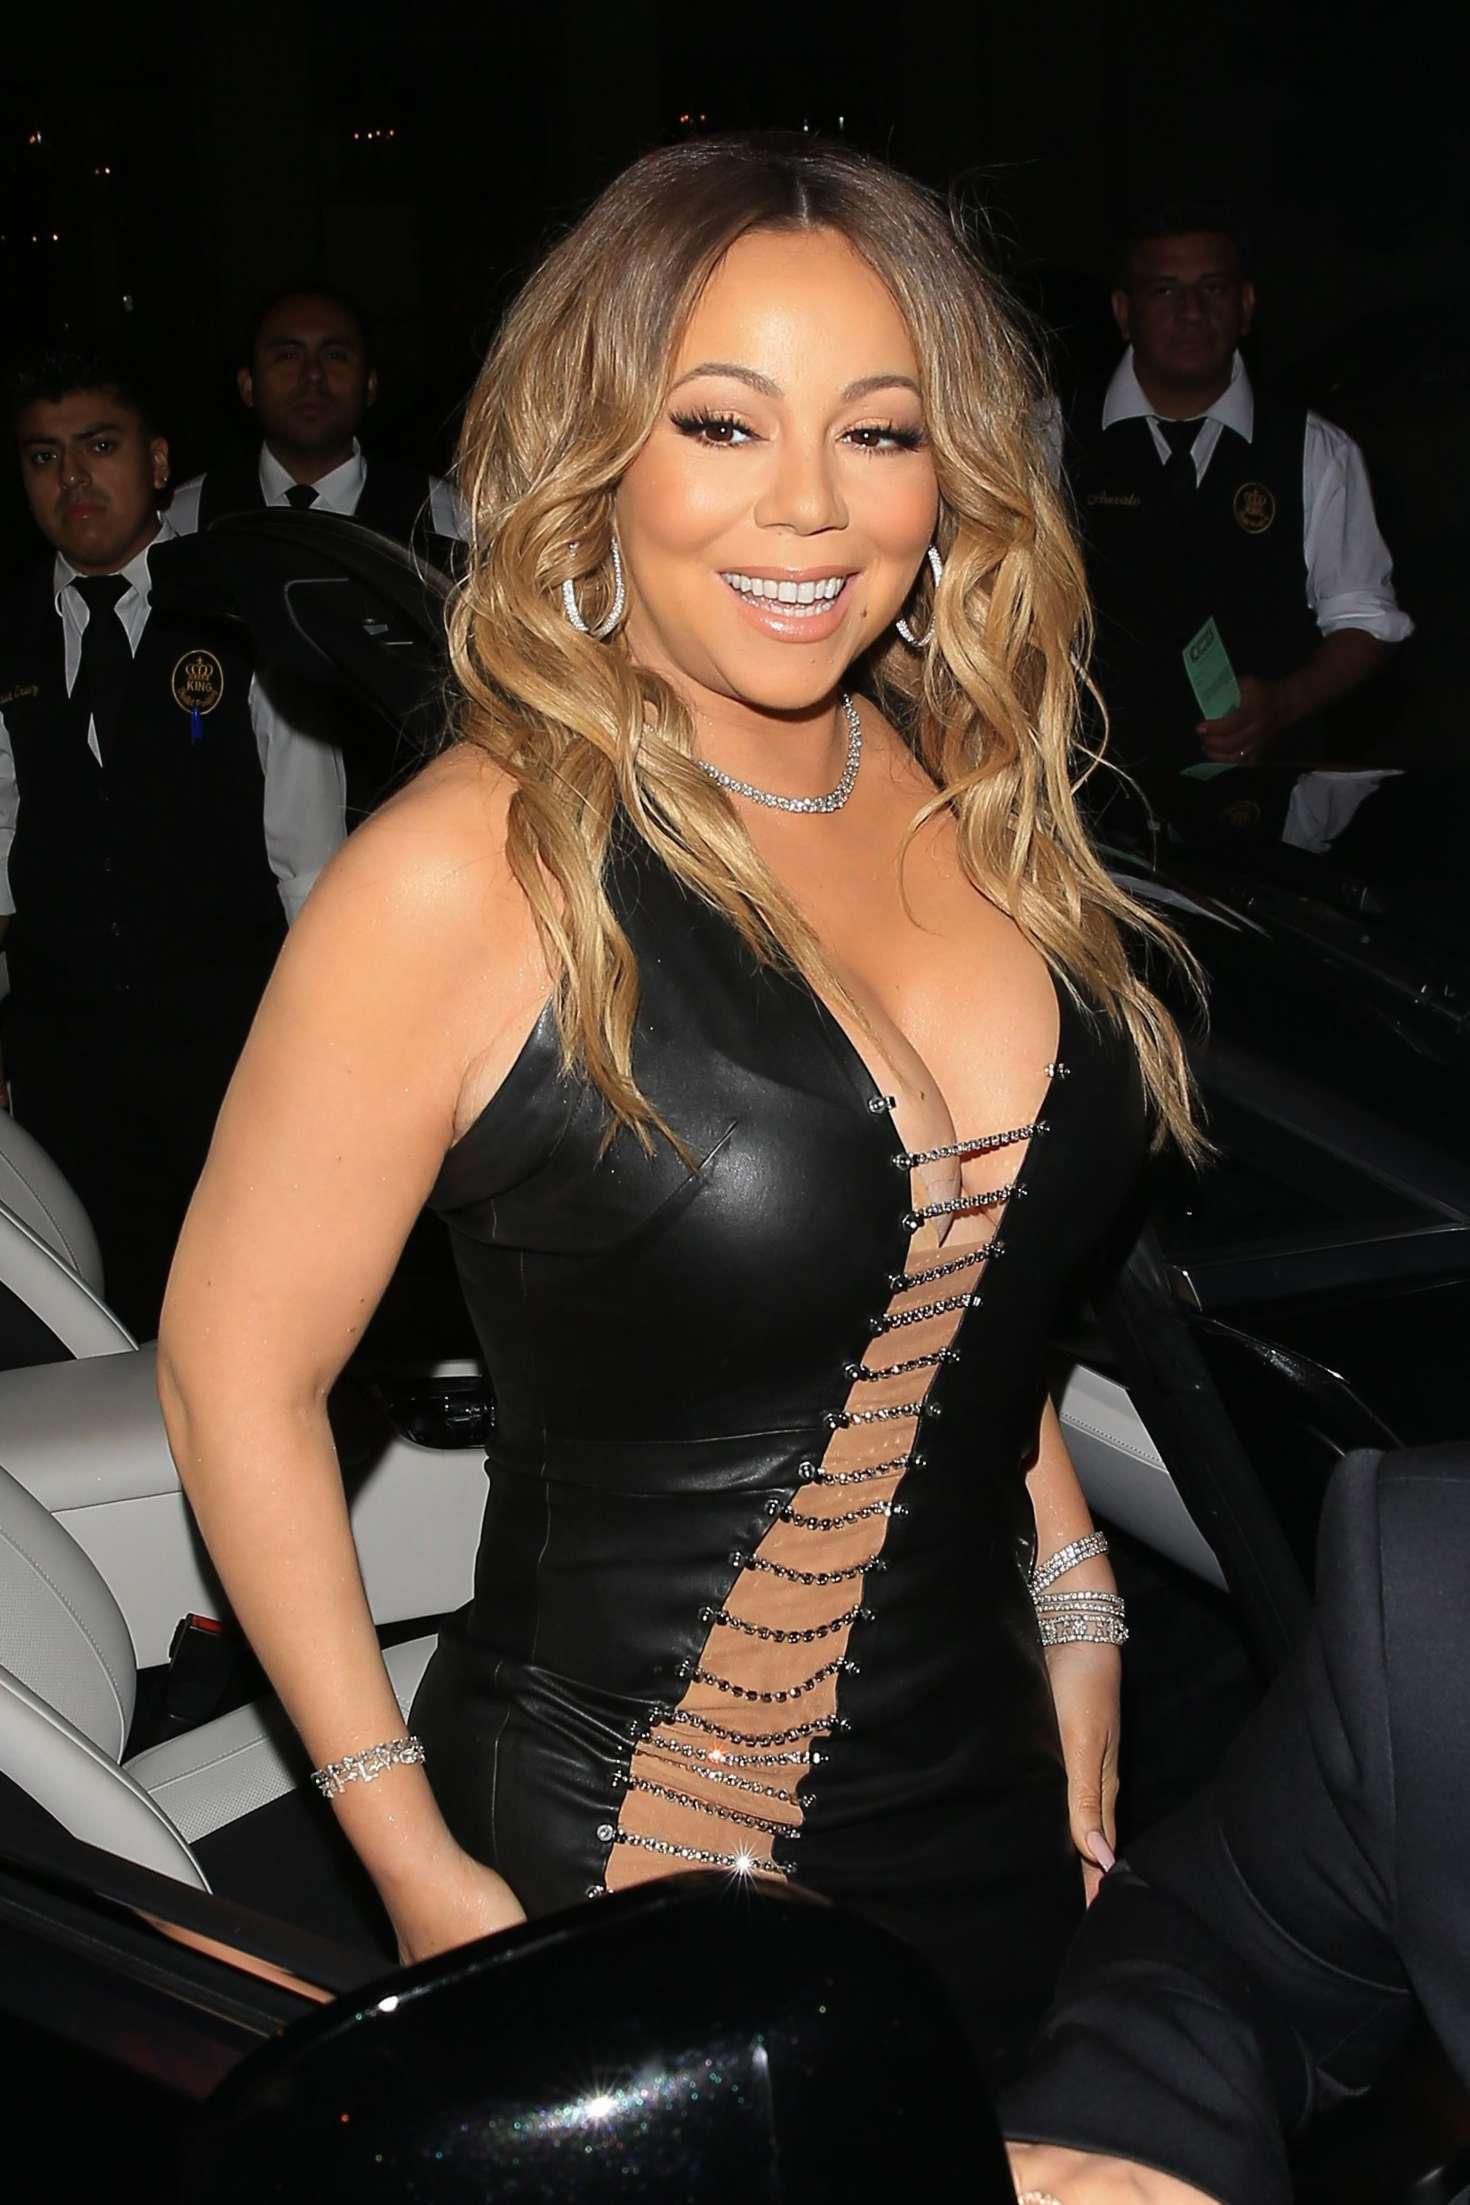 Mariah Carey in Tight Leather Dress -05 - GotCeleb